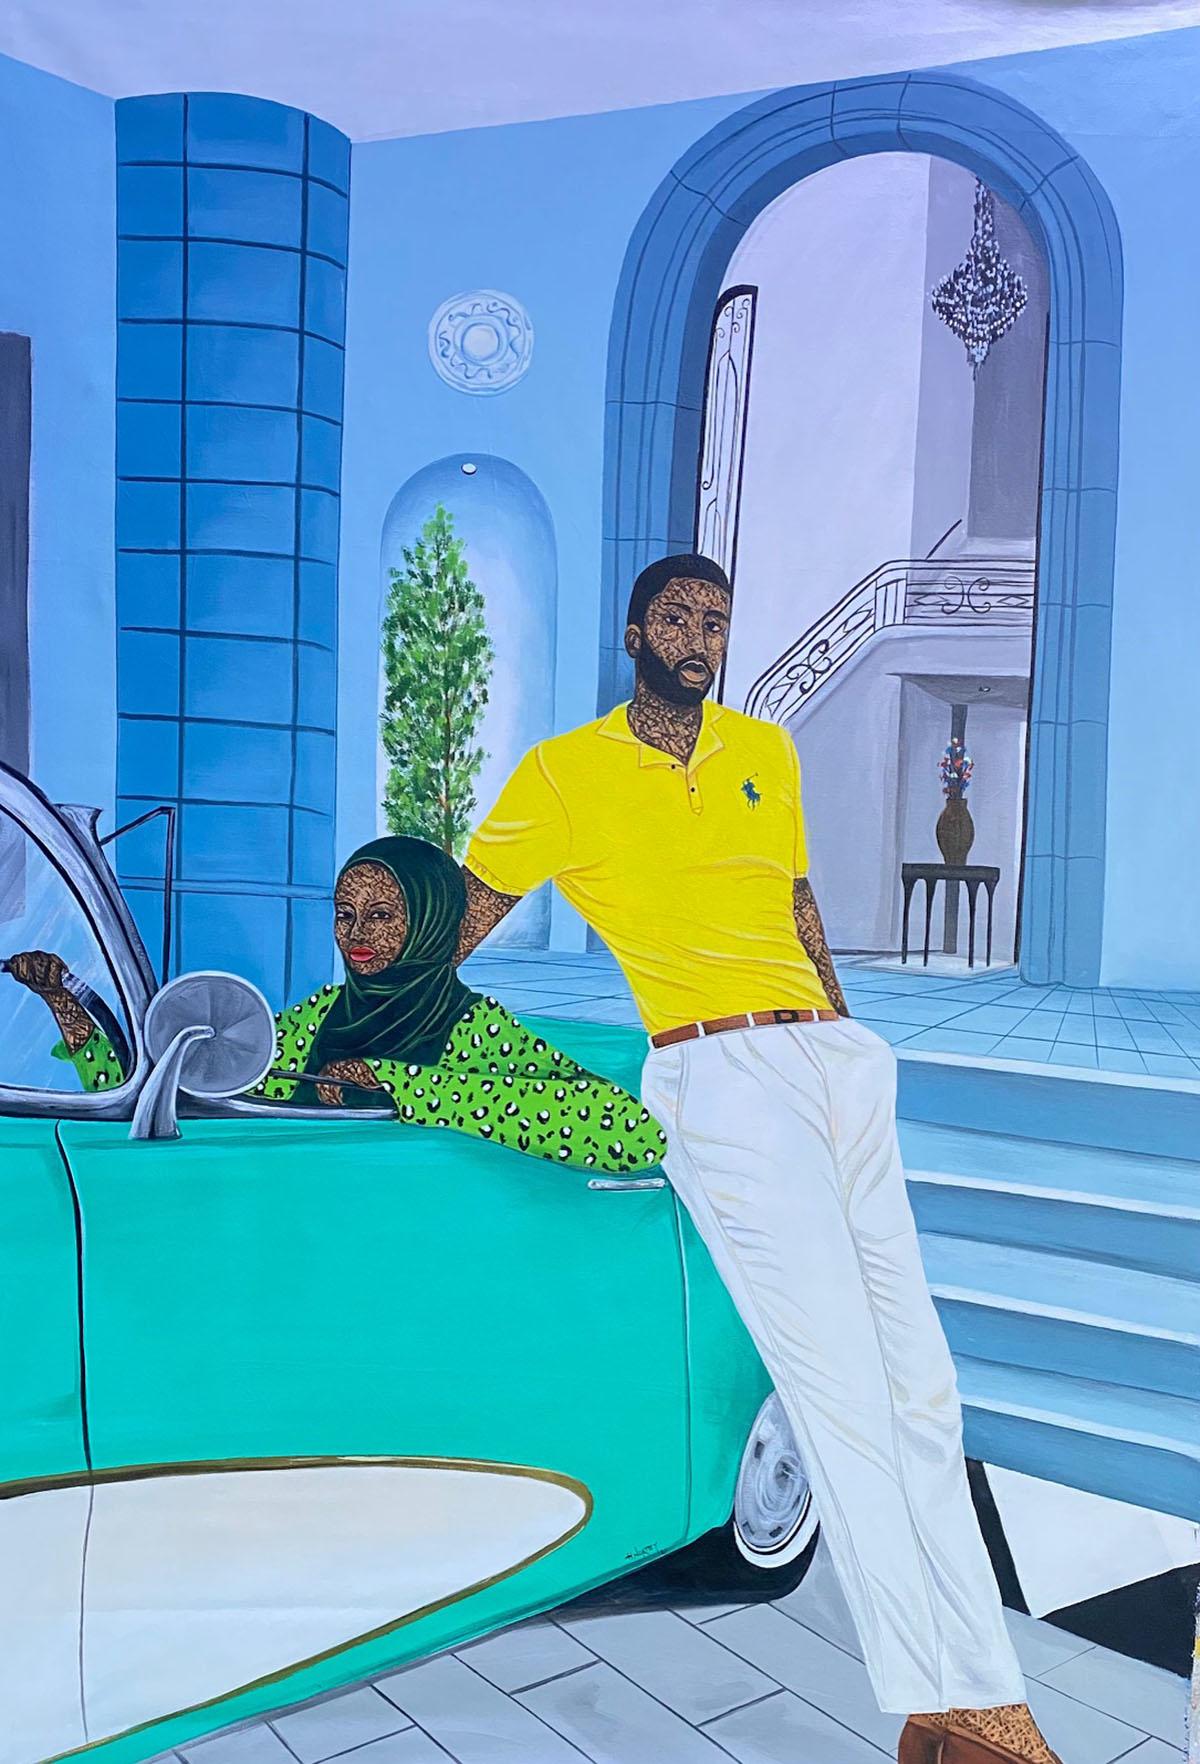 Accra-based ADA artist Hamid Nii Nortey